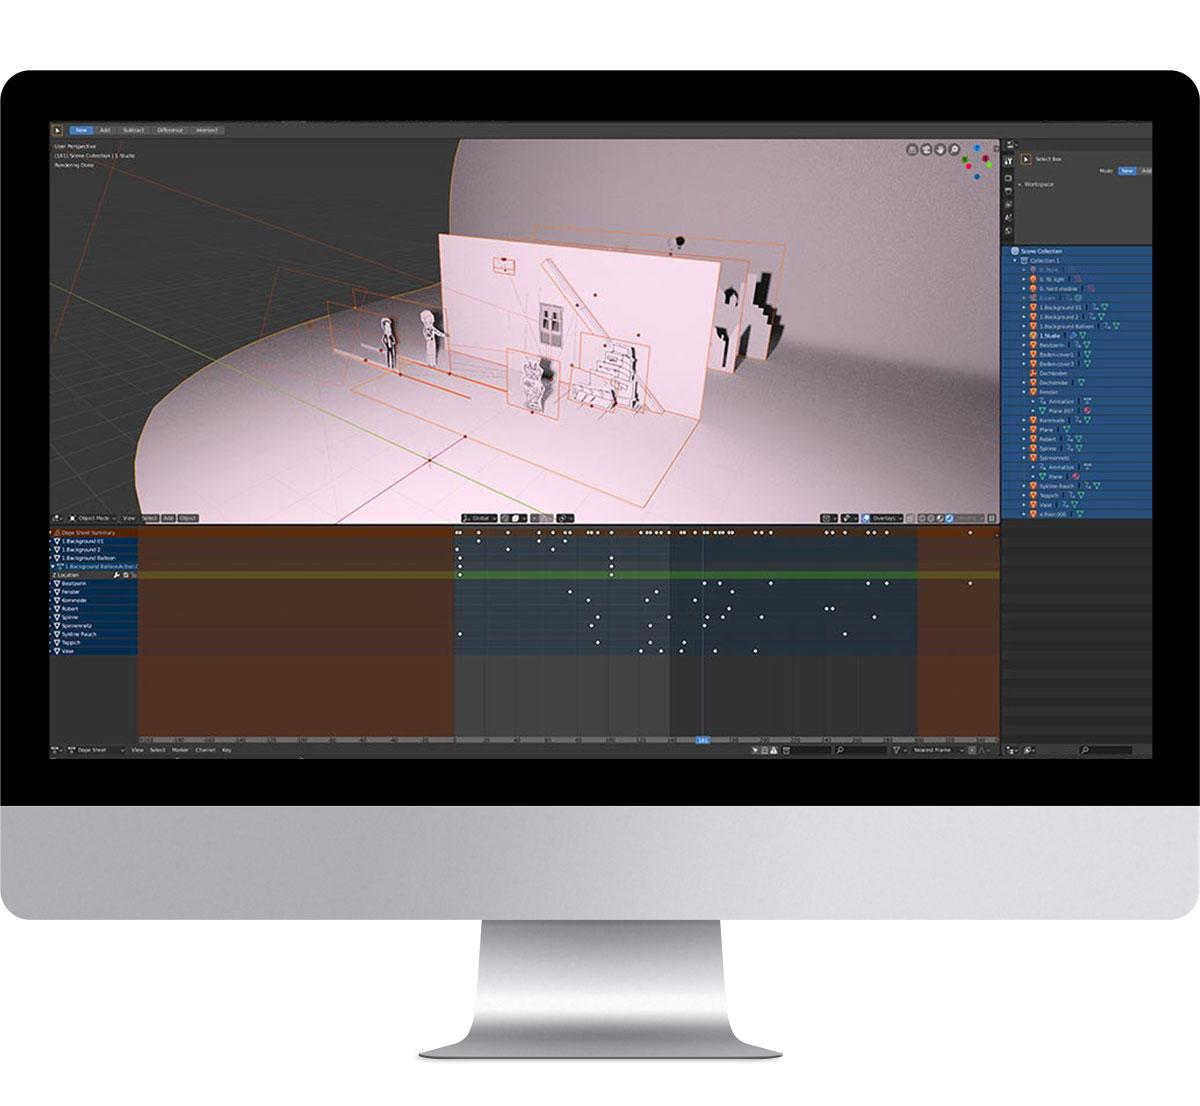 aleksundshantu-rbb-3d-screen